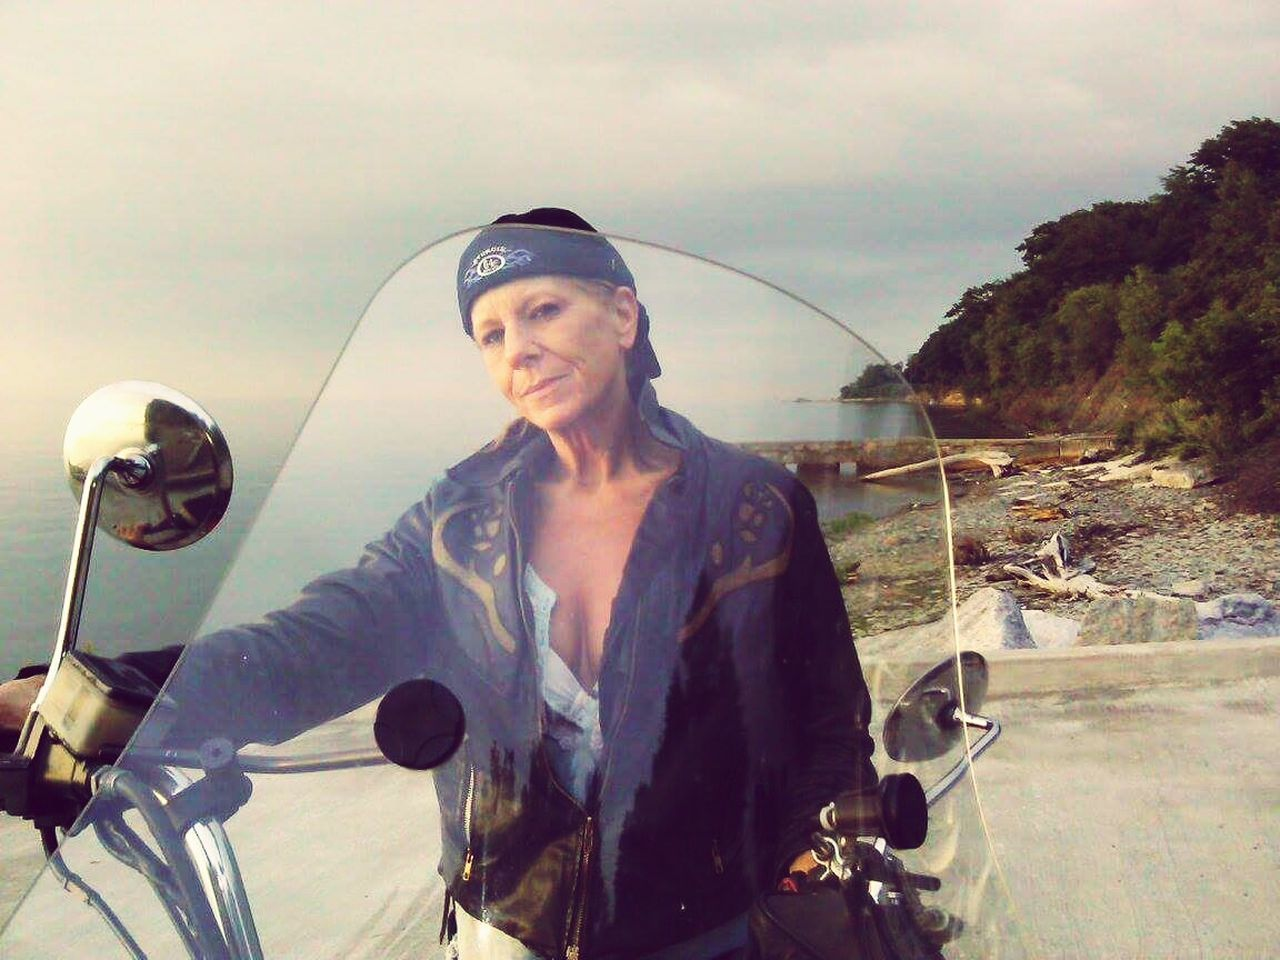 BikerGirl Beauty In Nature Beach Photography Scenery Pennsylvania